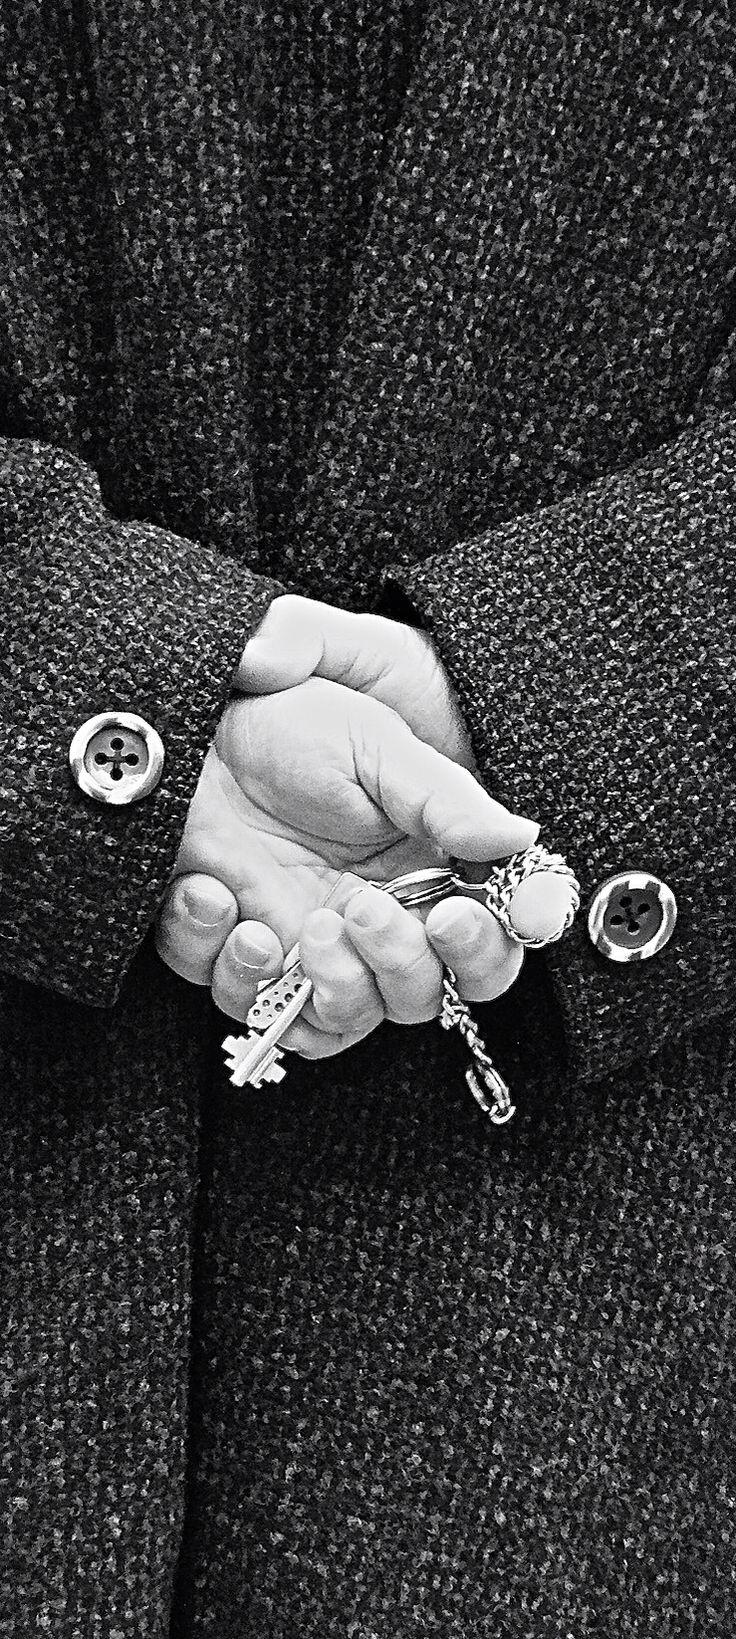 Elderly people hold keys to wisdom, janholmberg.weebly.com